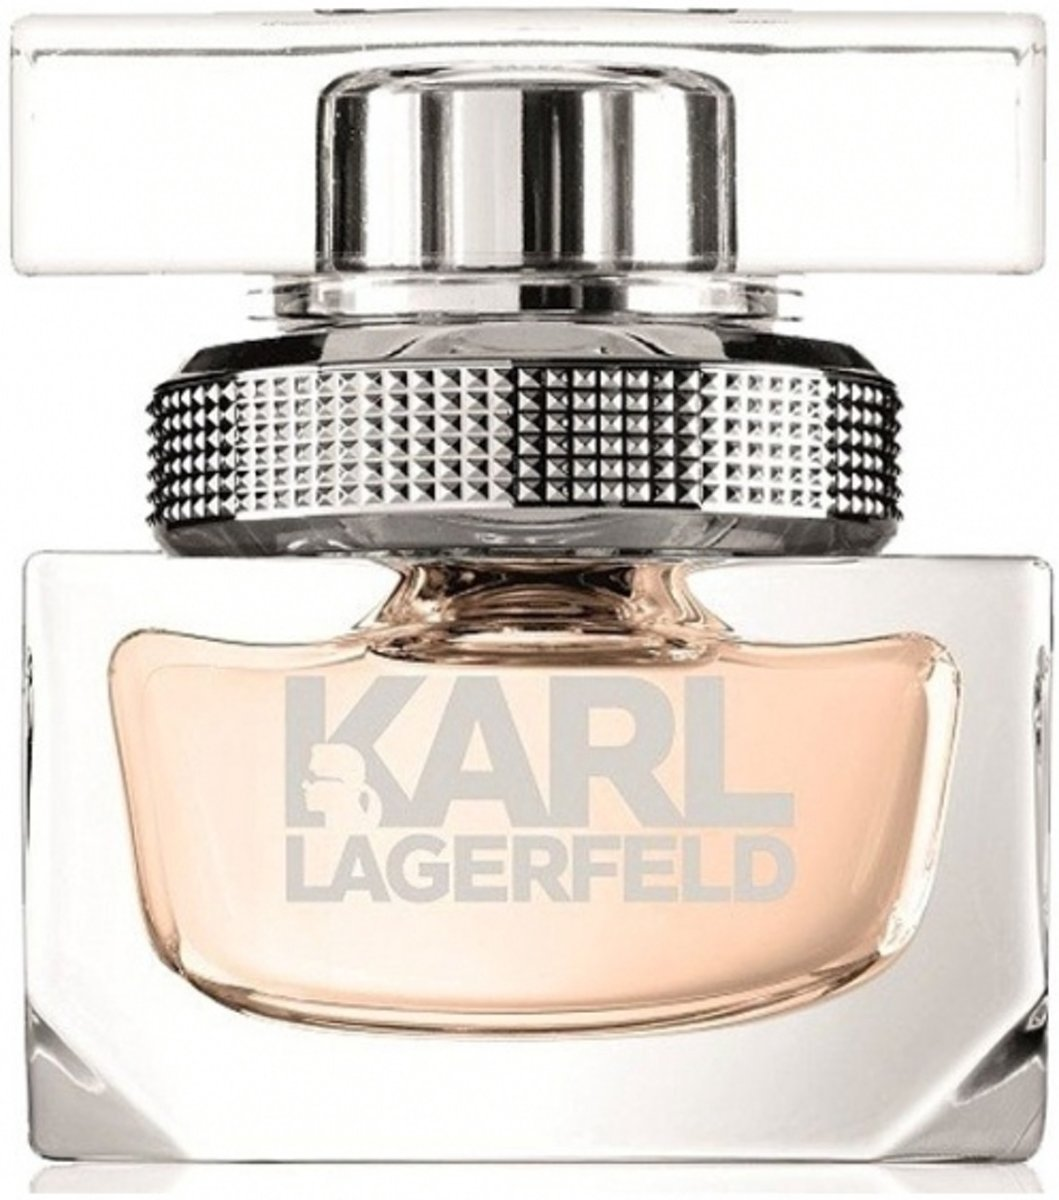 Karl Lagerfeld - 85 ml - Eau de parfum thumbnail